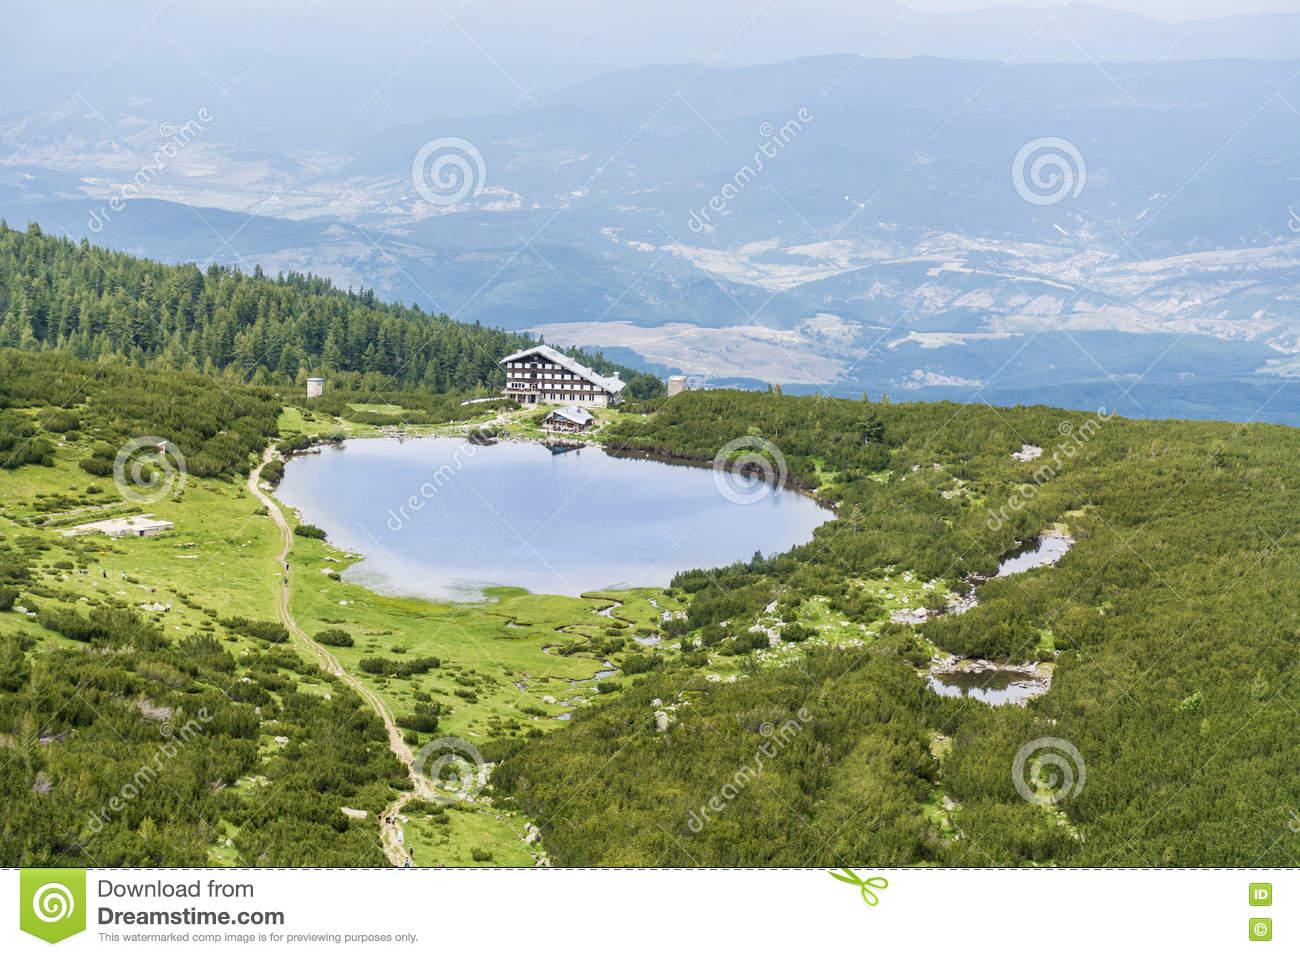 Bezbog Hut And Lake In Pirin Mountain,Bulgaria Stock Photo.